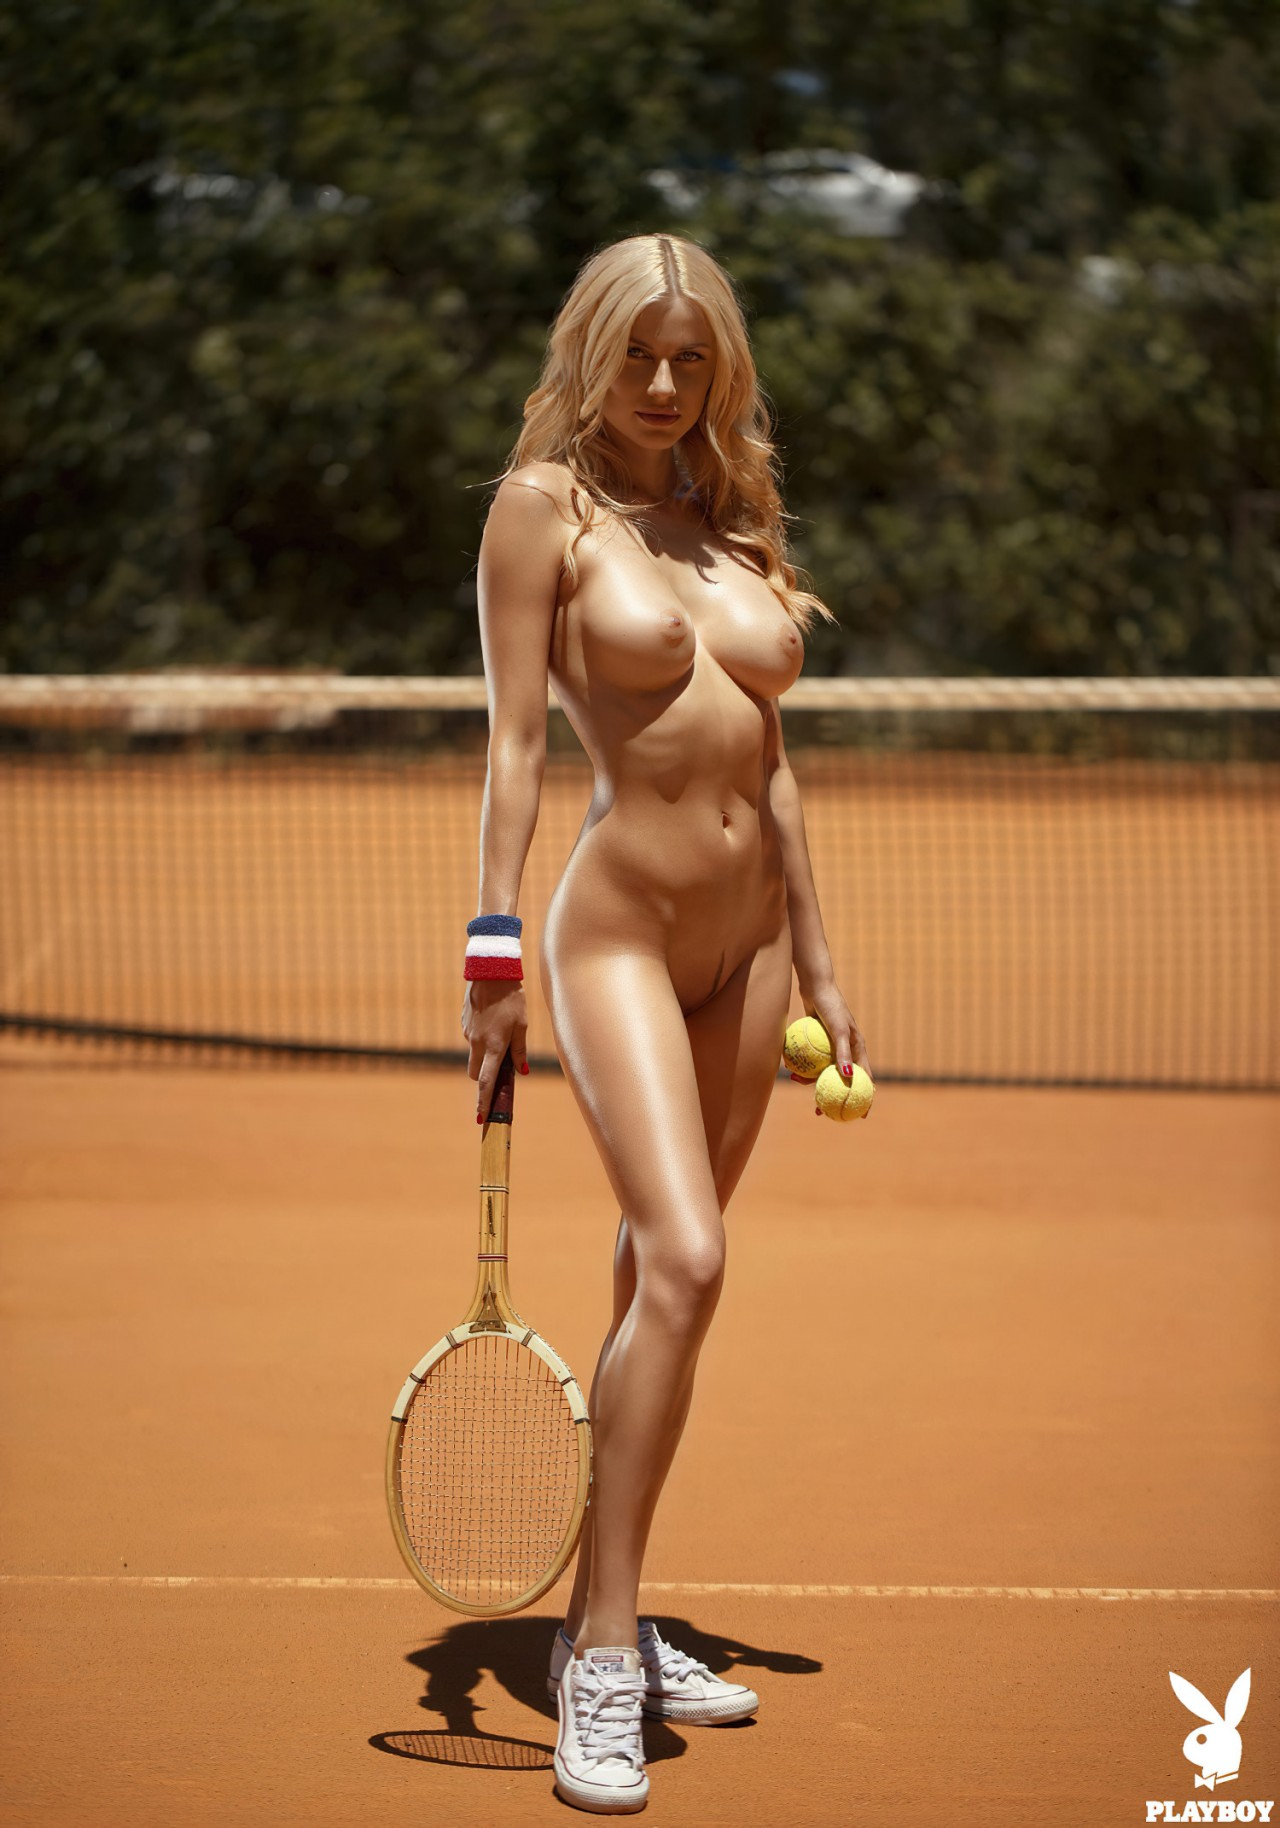 Olga De Mar Playboy (9)